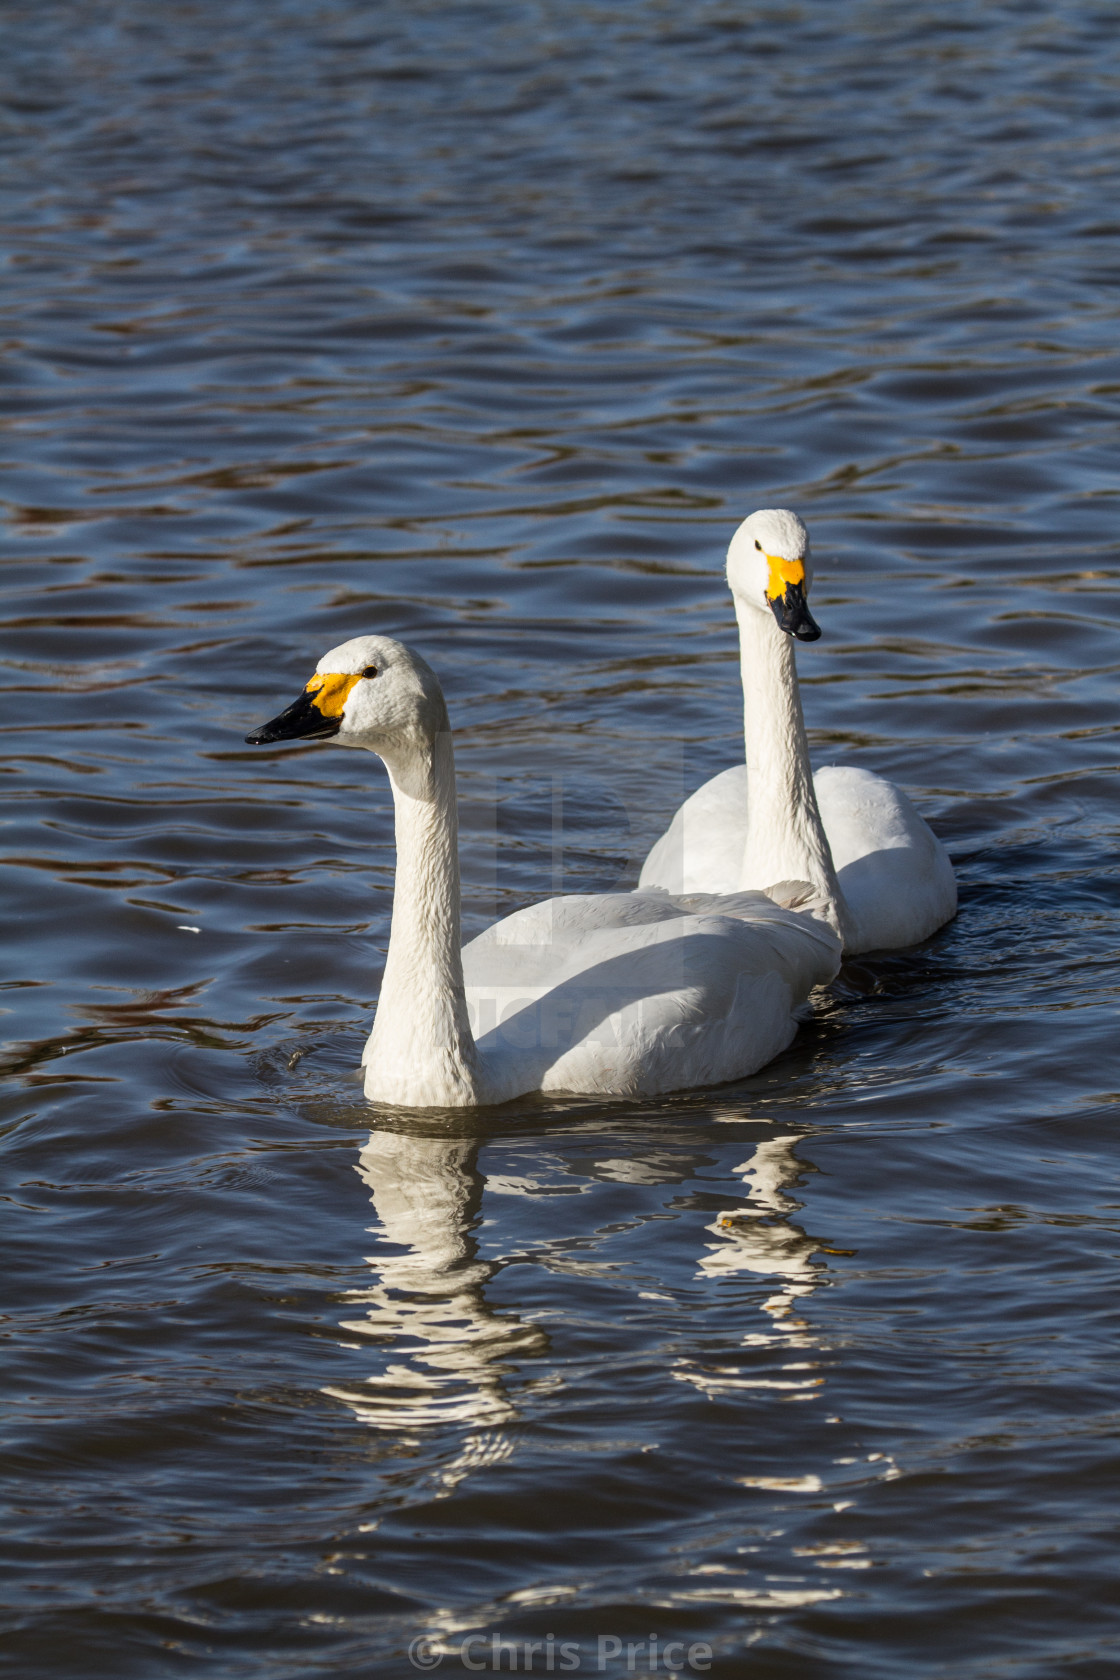 """Whooper Swans at WWT Slimbridge"" stock image"